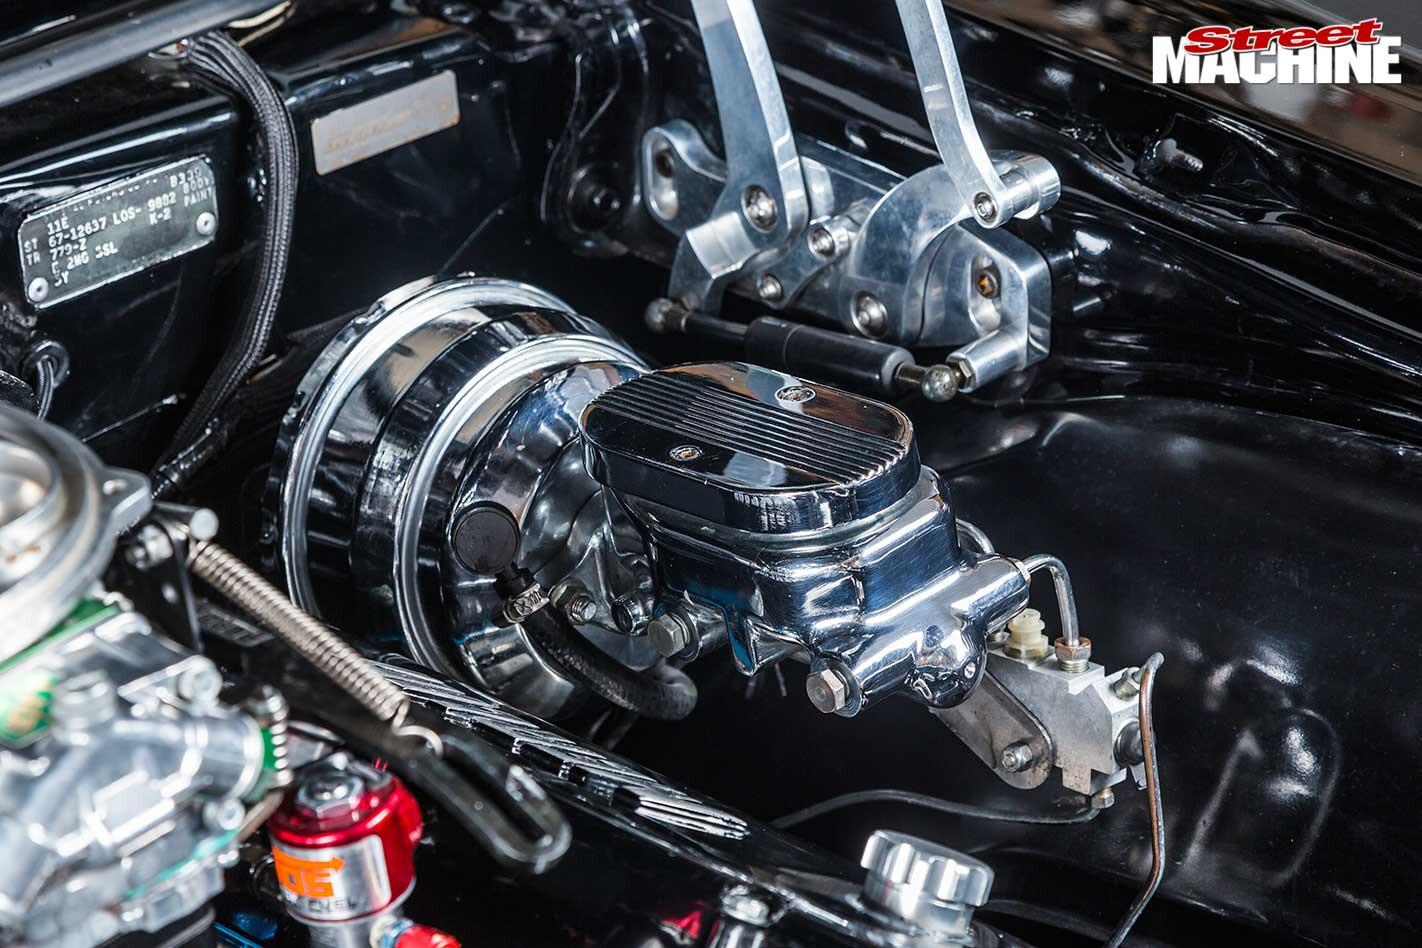 Chevrolet Camaro engine bay